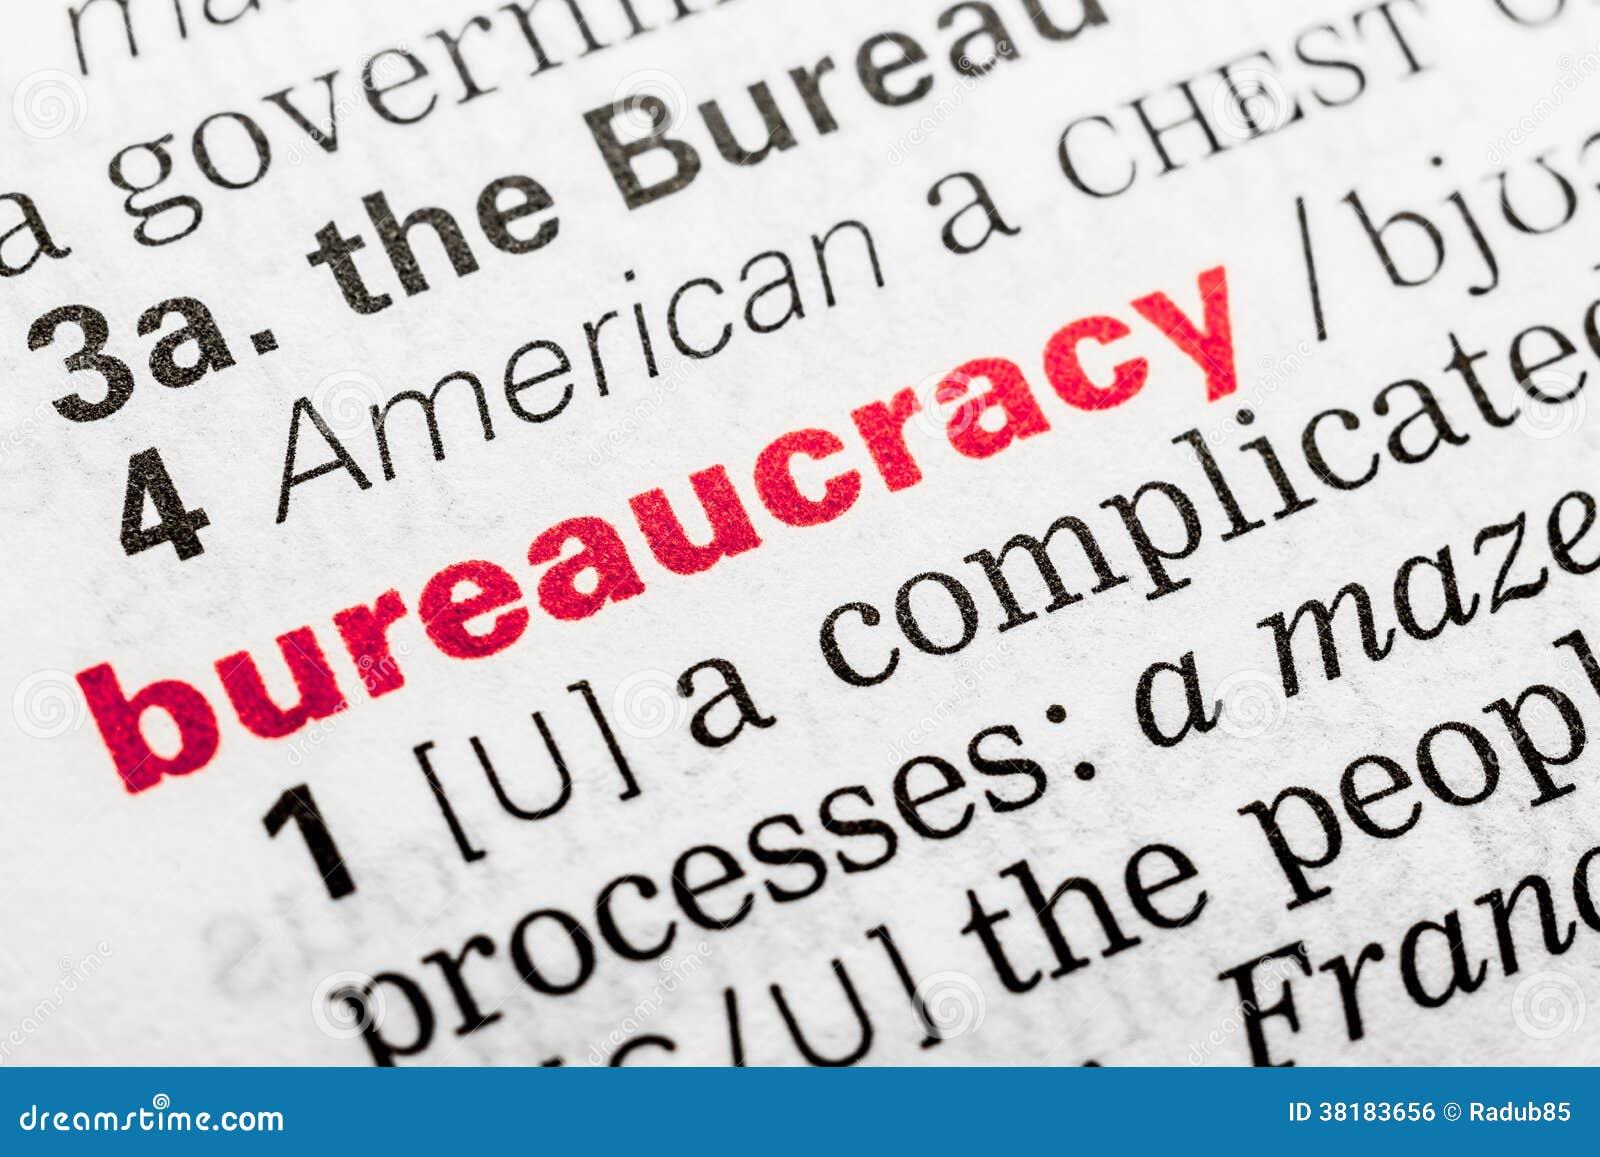 Bureaucracy Word Definition Stock Photo Image 38183656